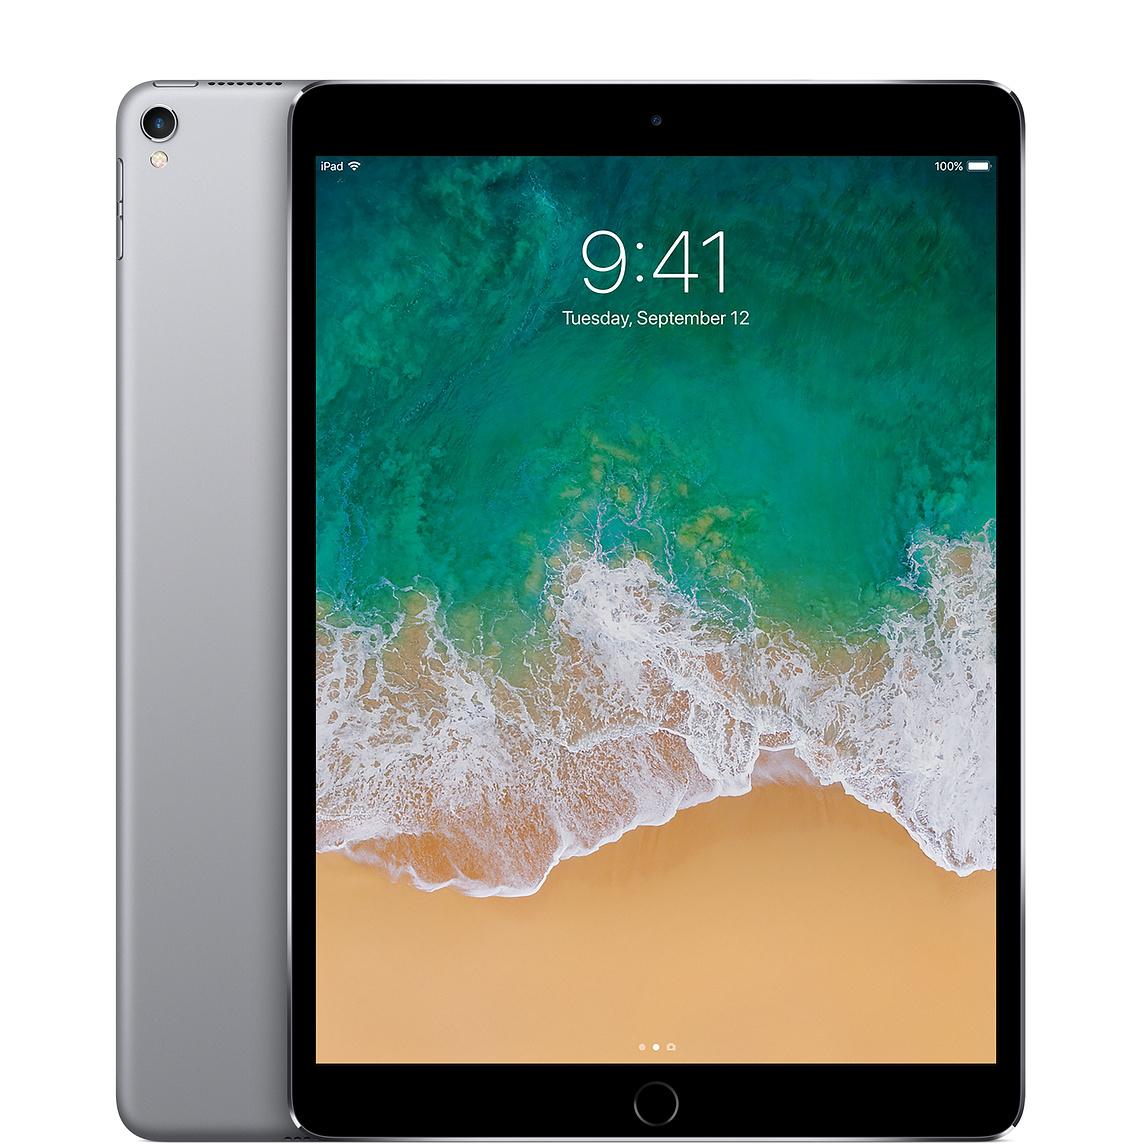 Apple iPad Pro 10.5-inch Wi-Fi + Cellular 512GB - Space Grey